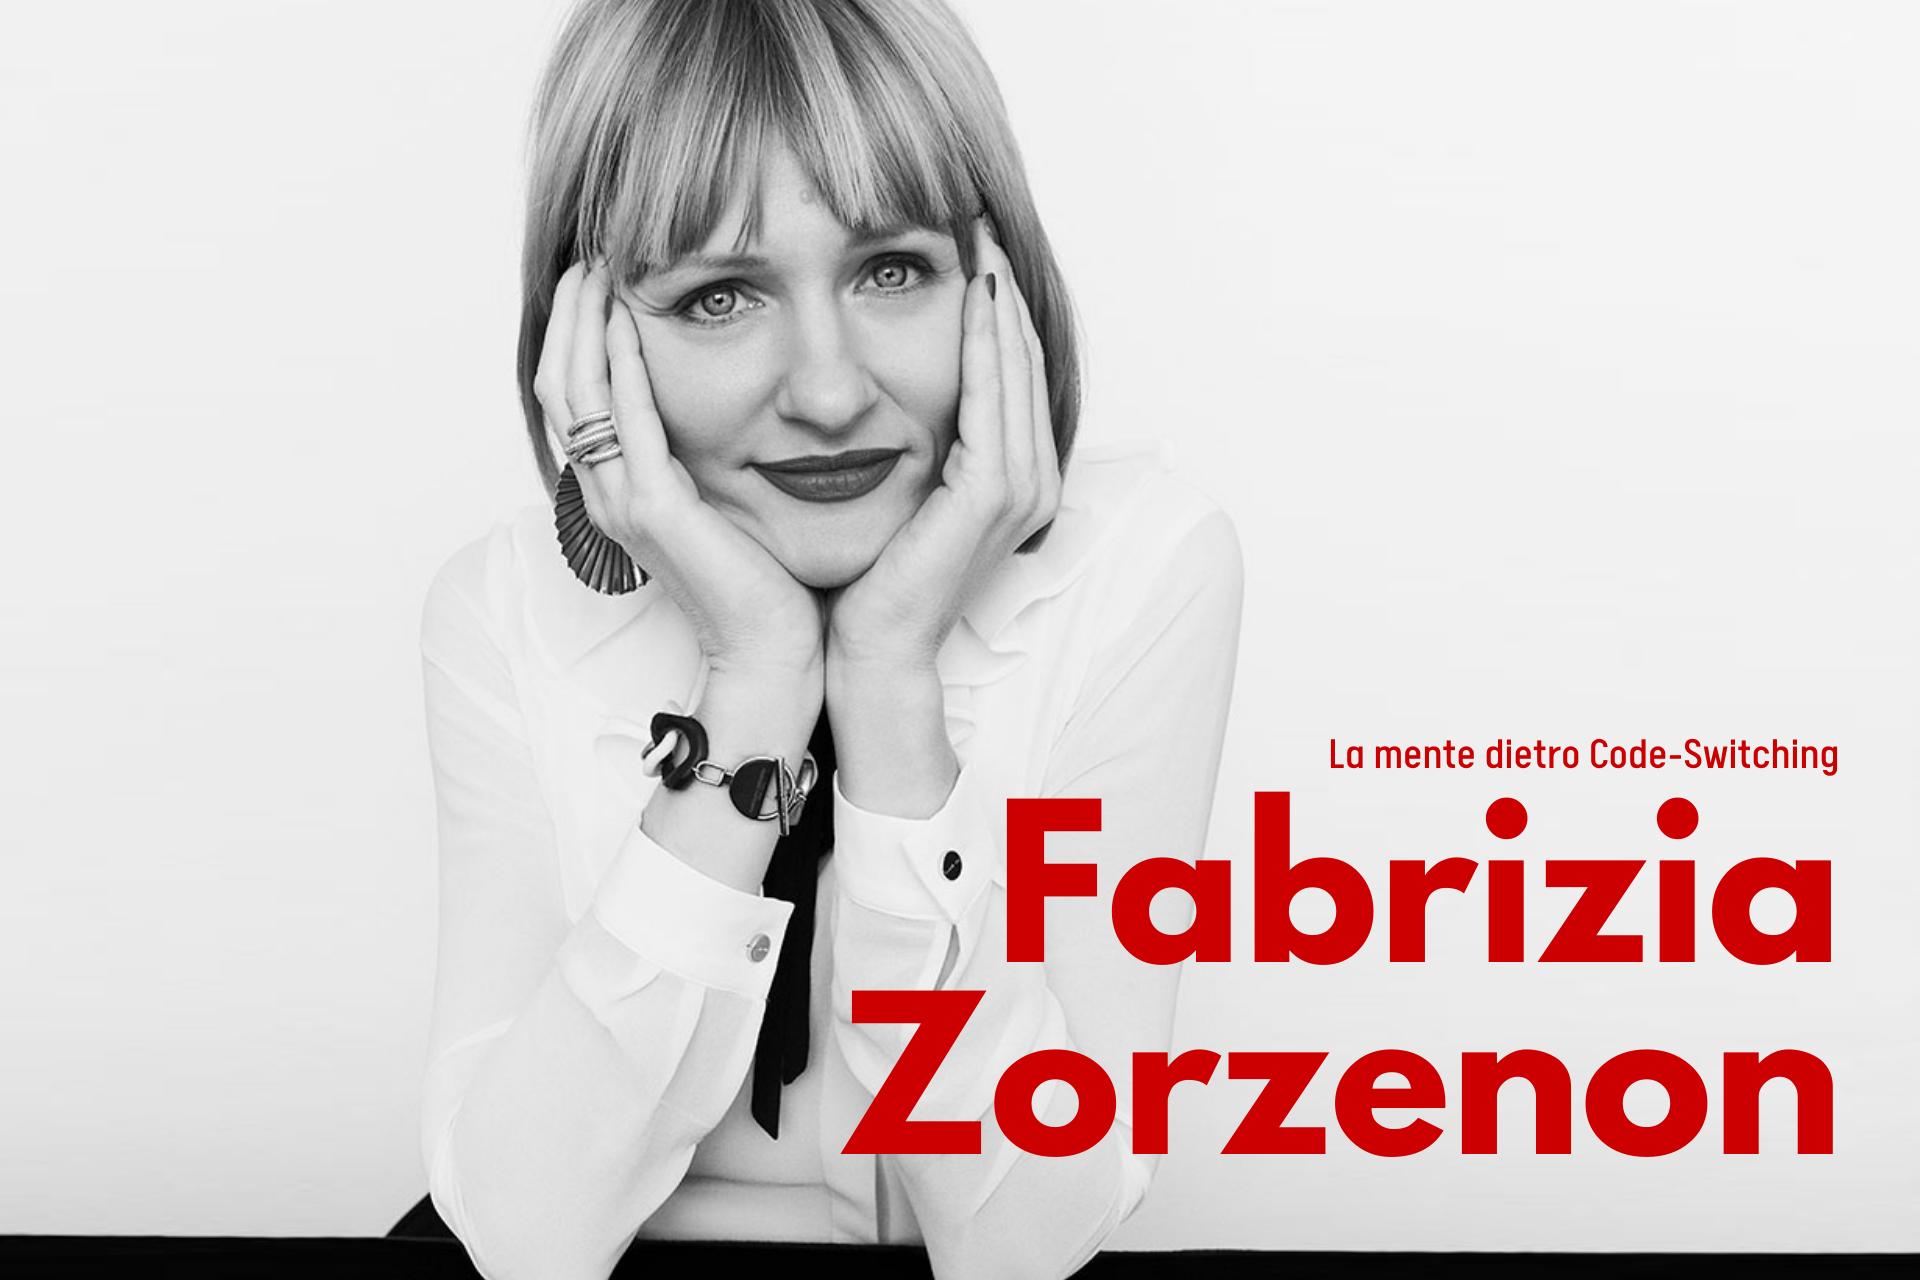 Fabrizia Zorzenon Code-Switching